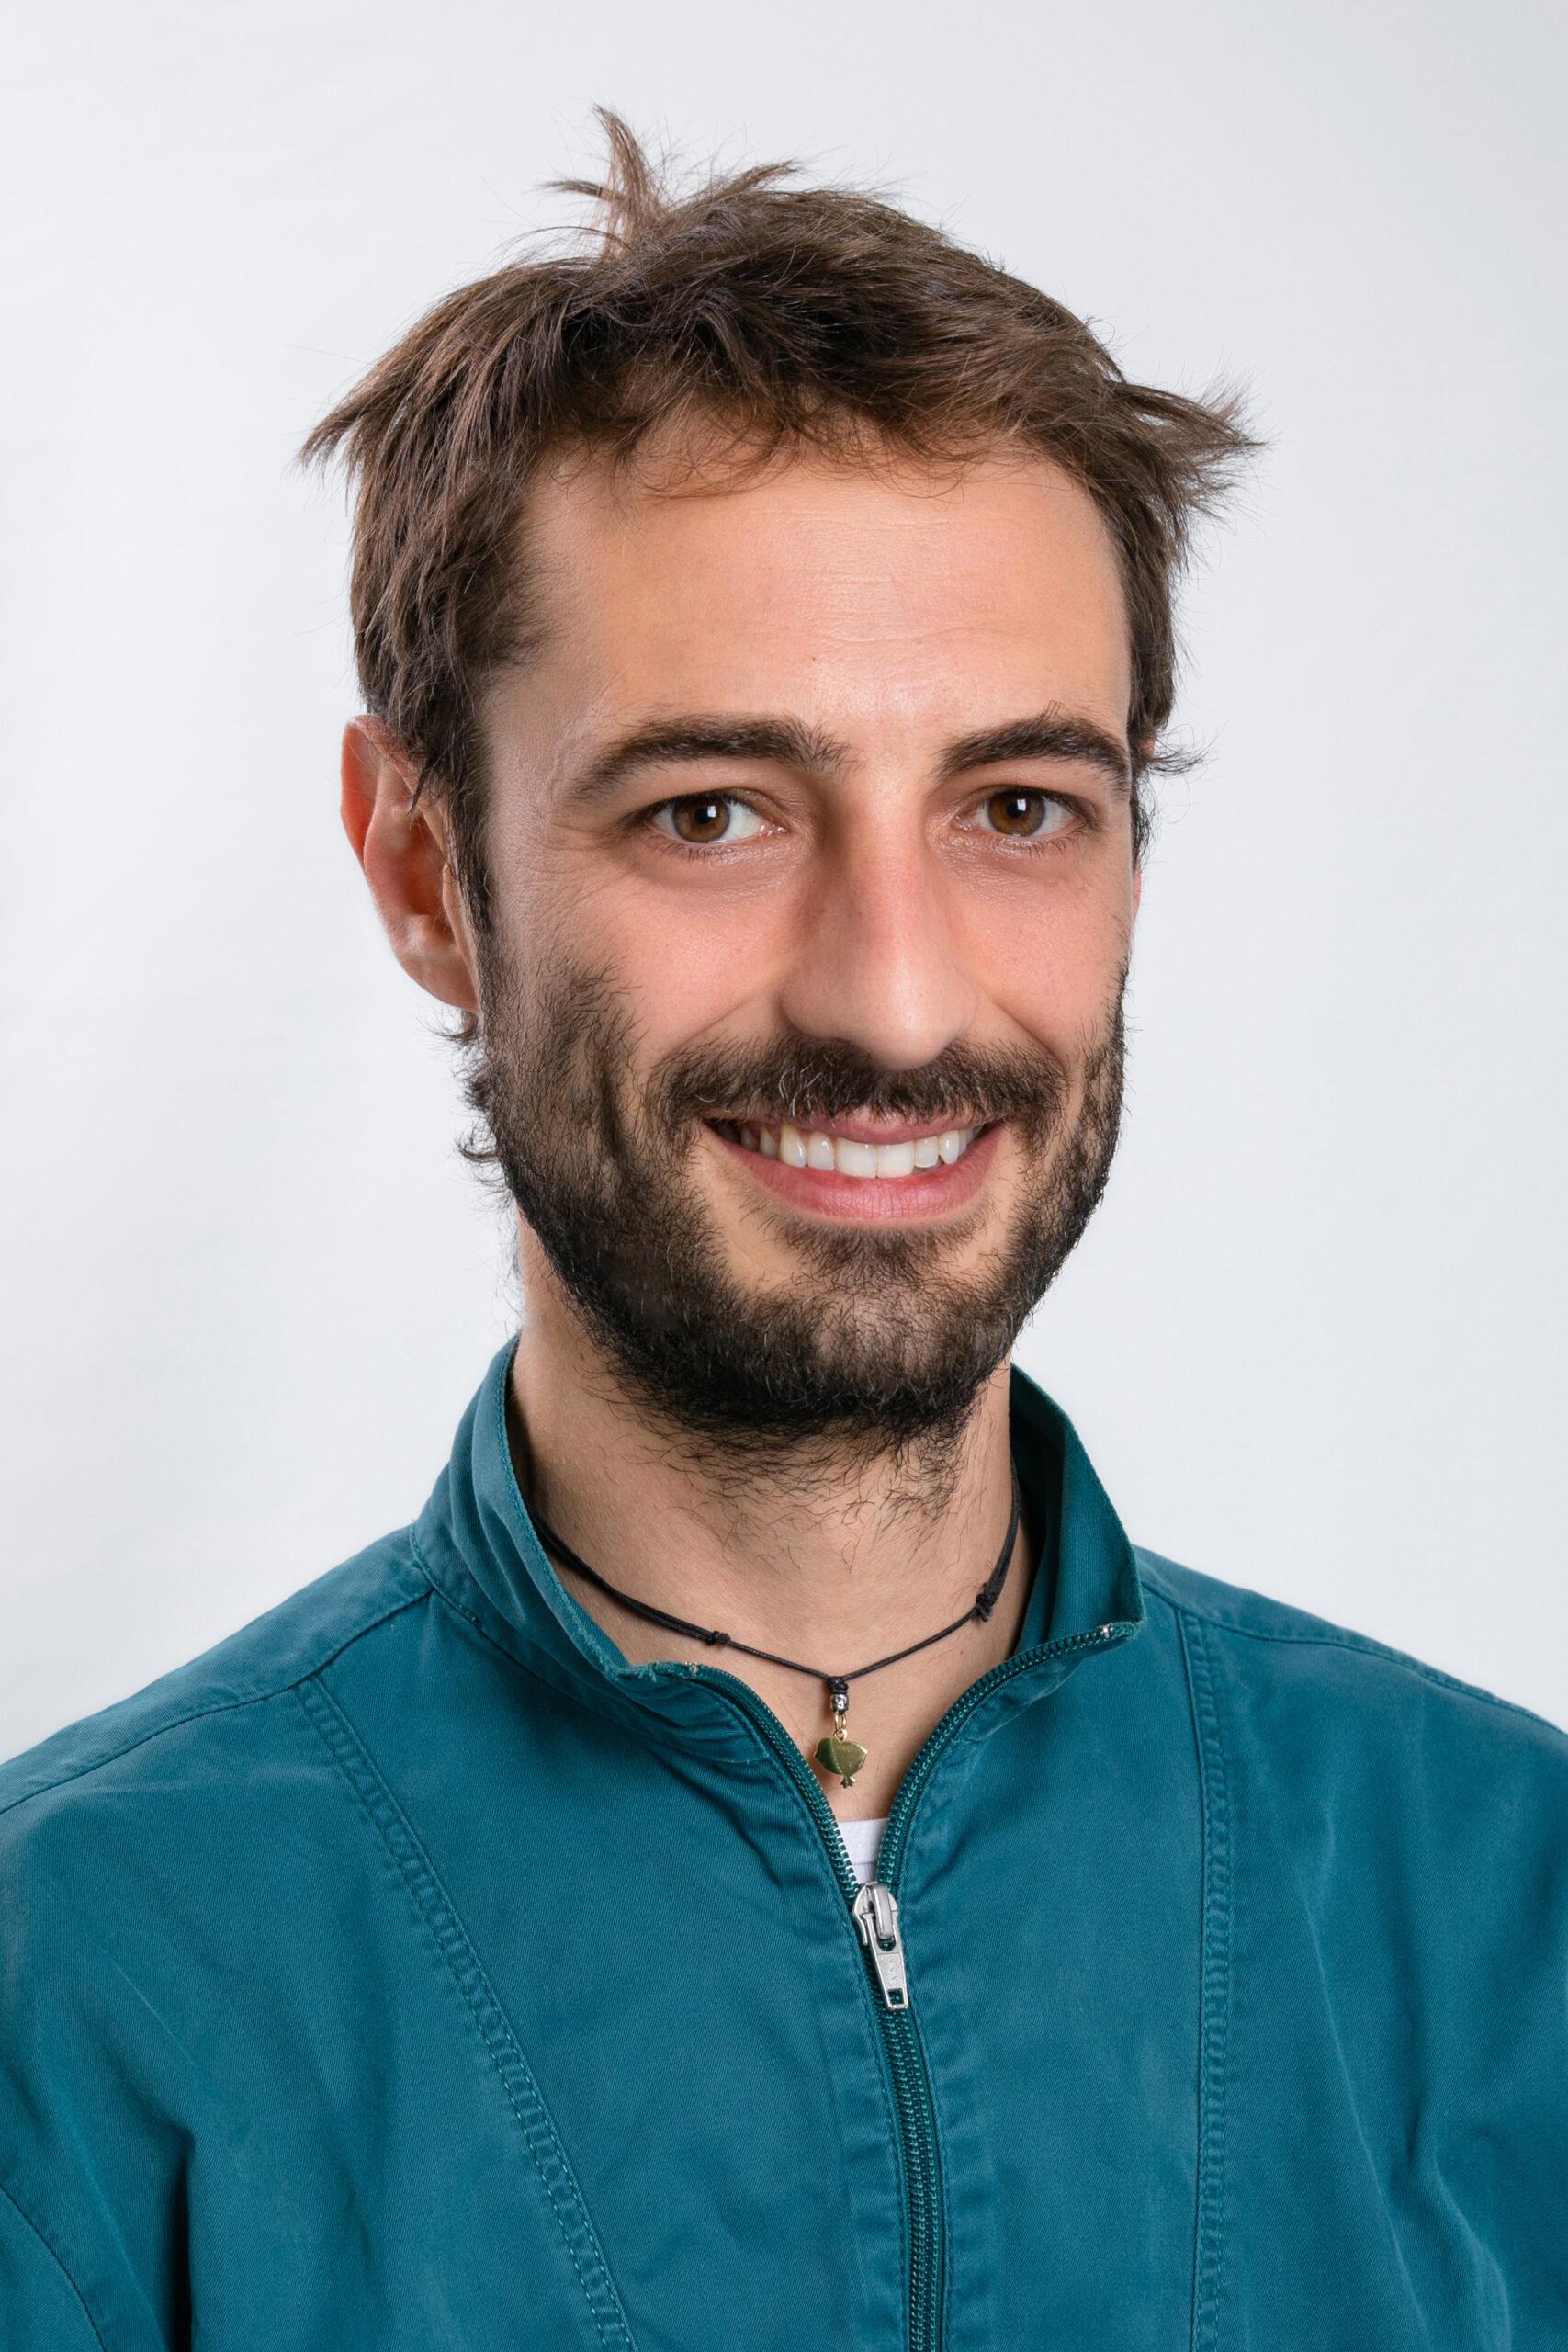 Dott. Paolo Pezzotta